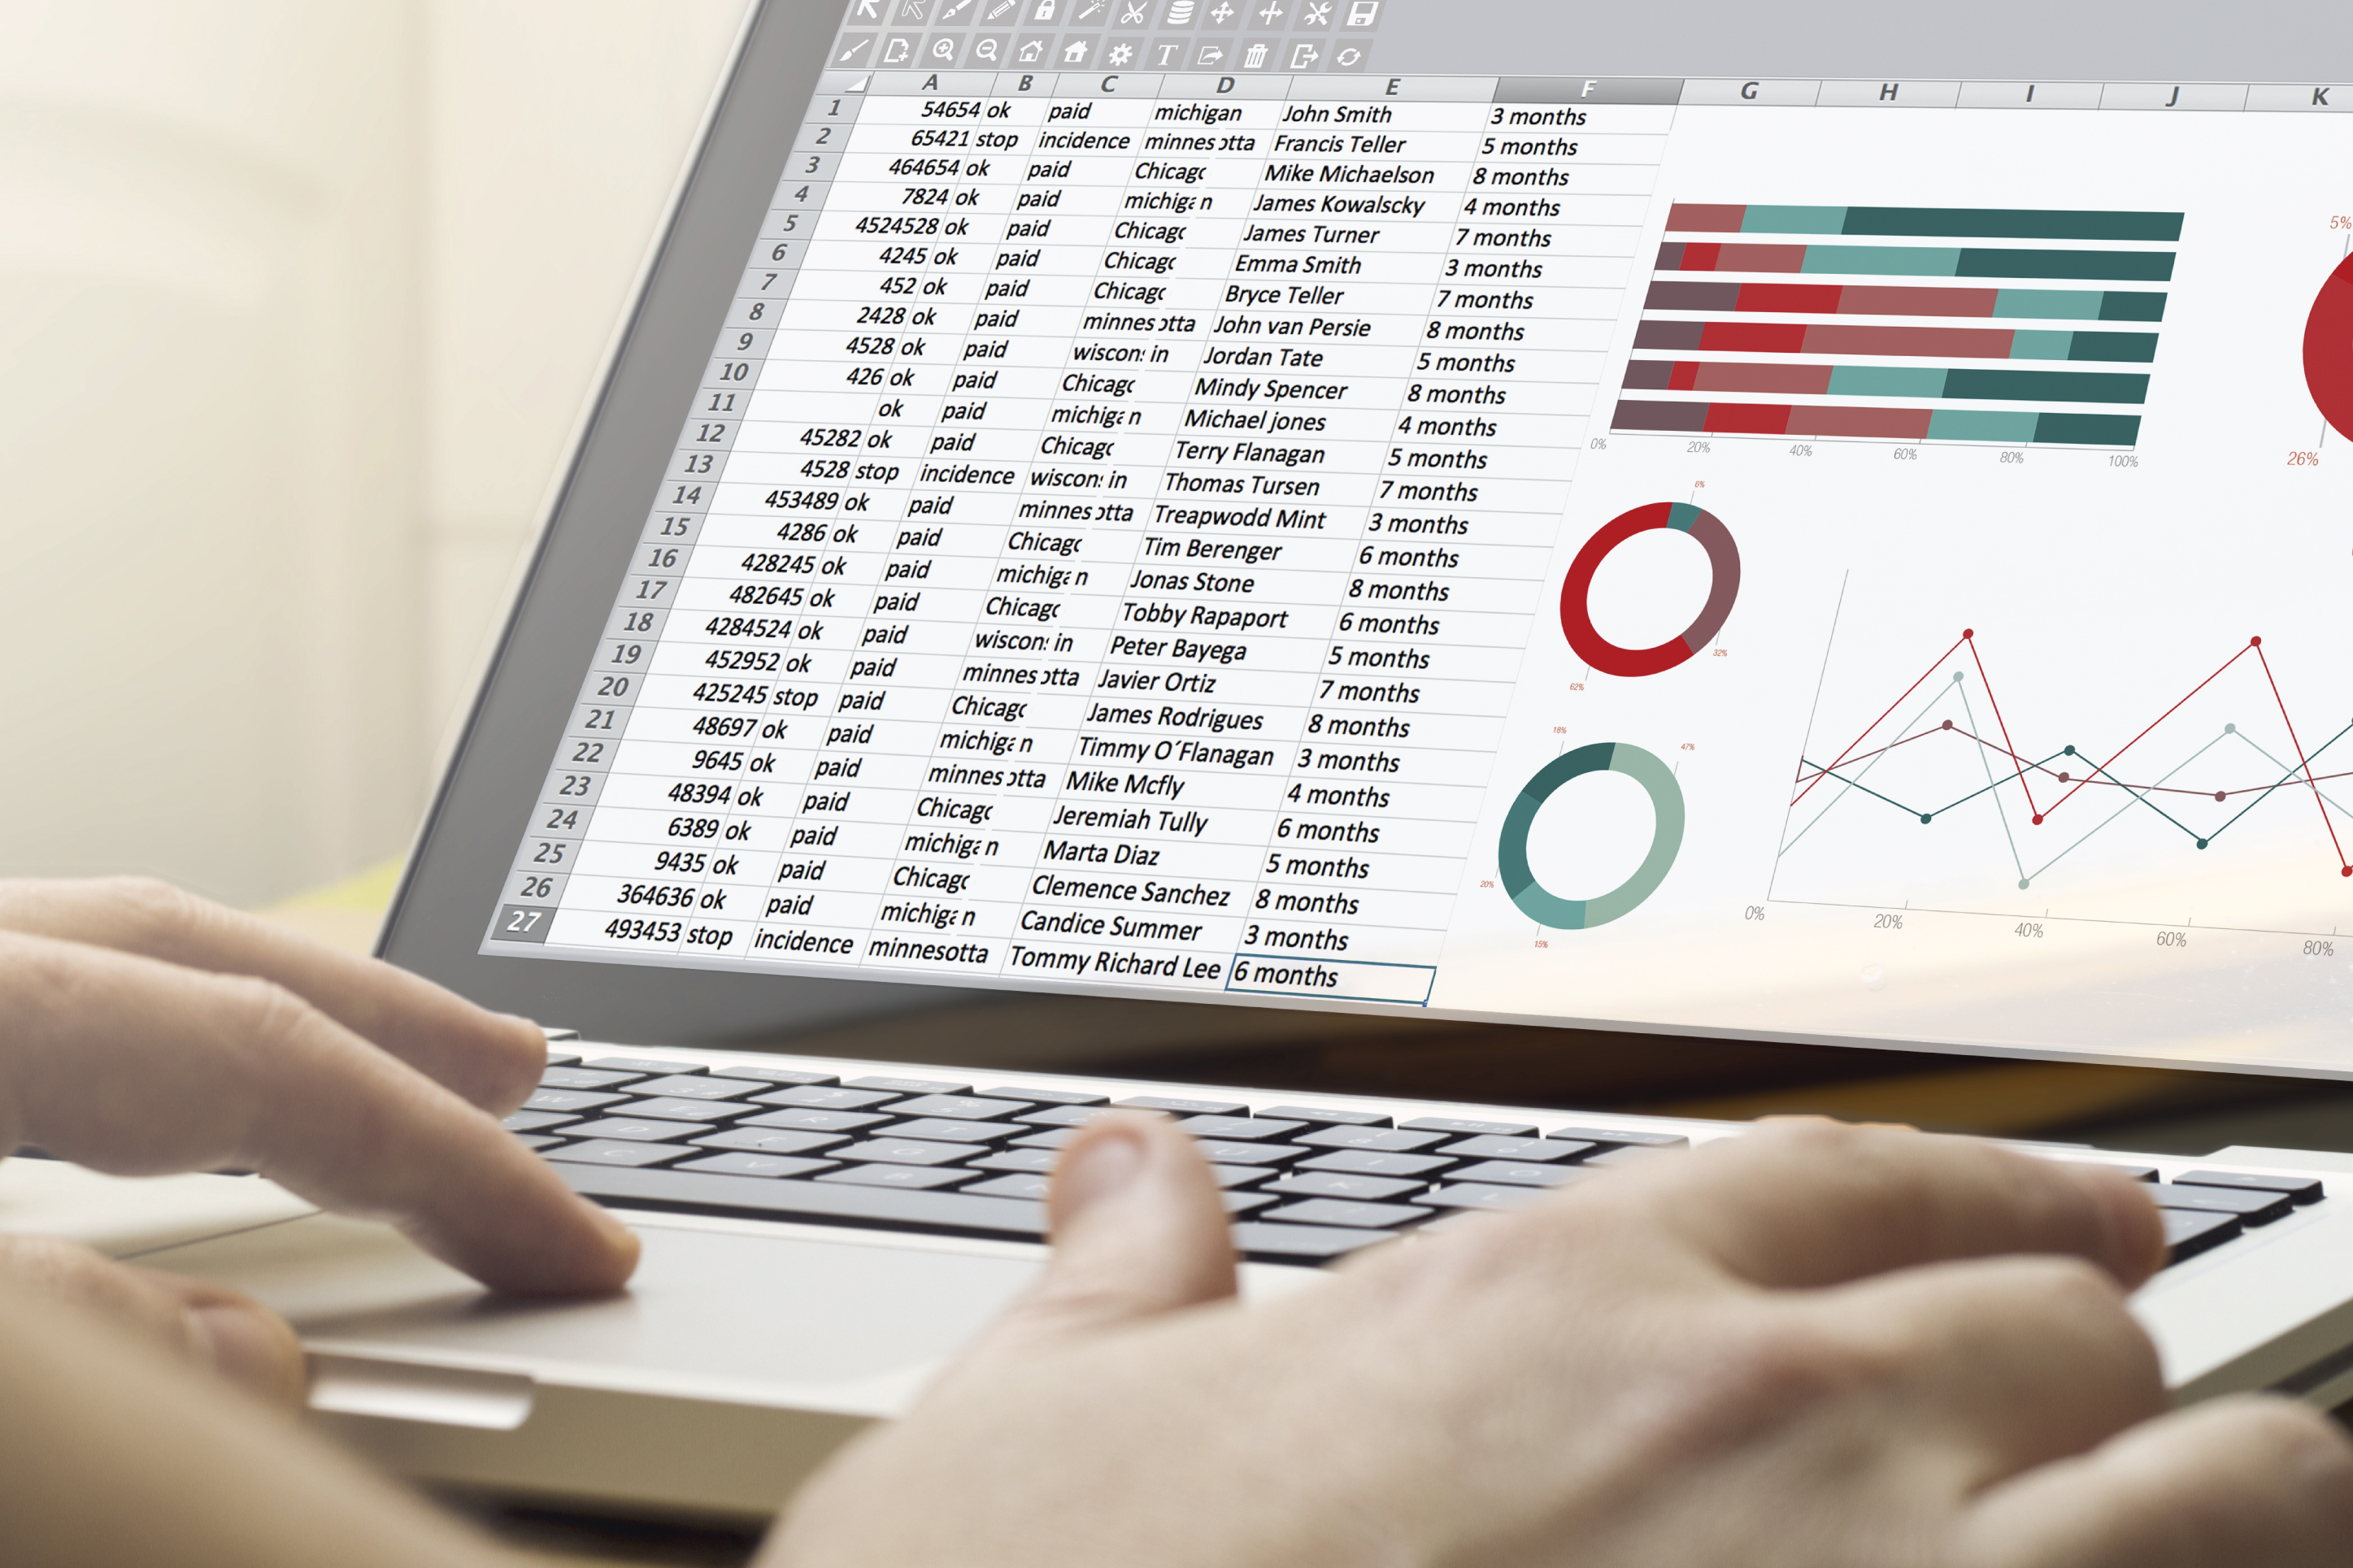 RMCU_Blog_Financial_Tools_Small_Business_3